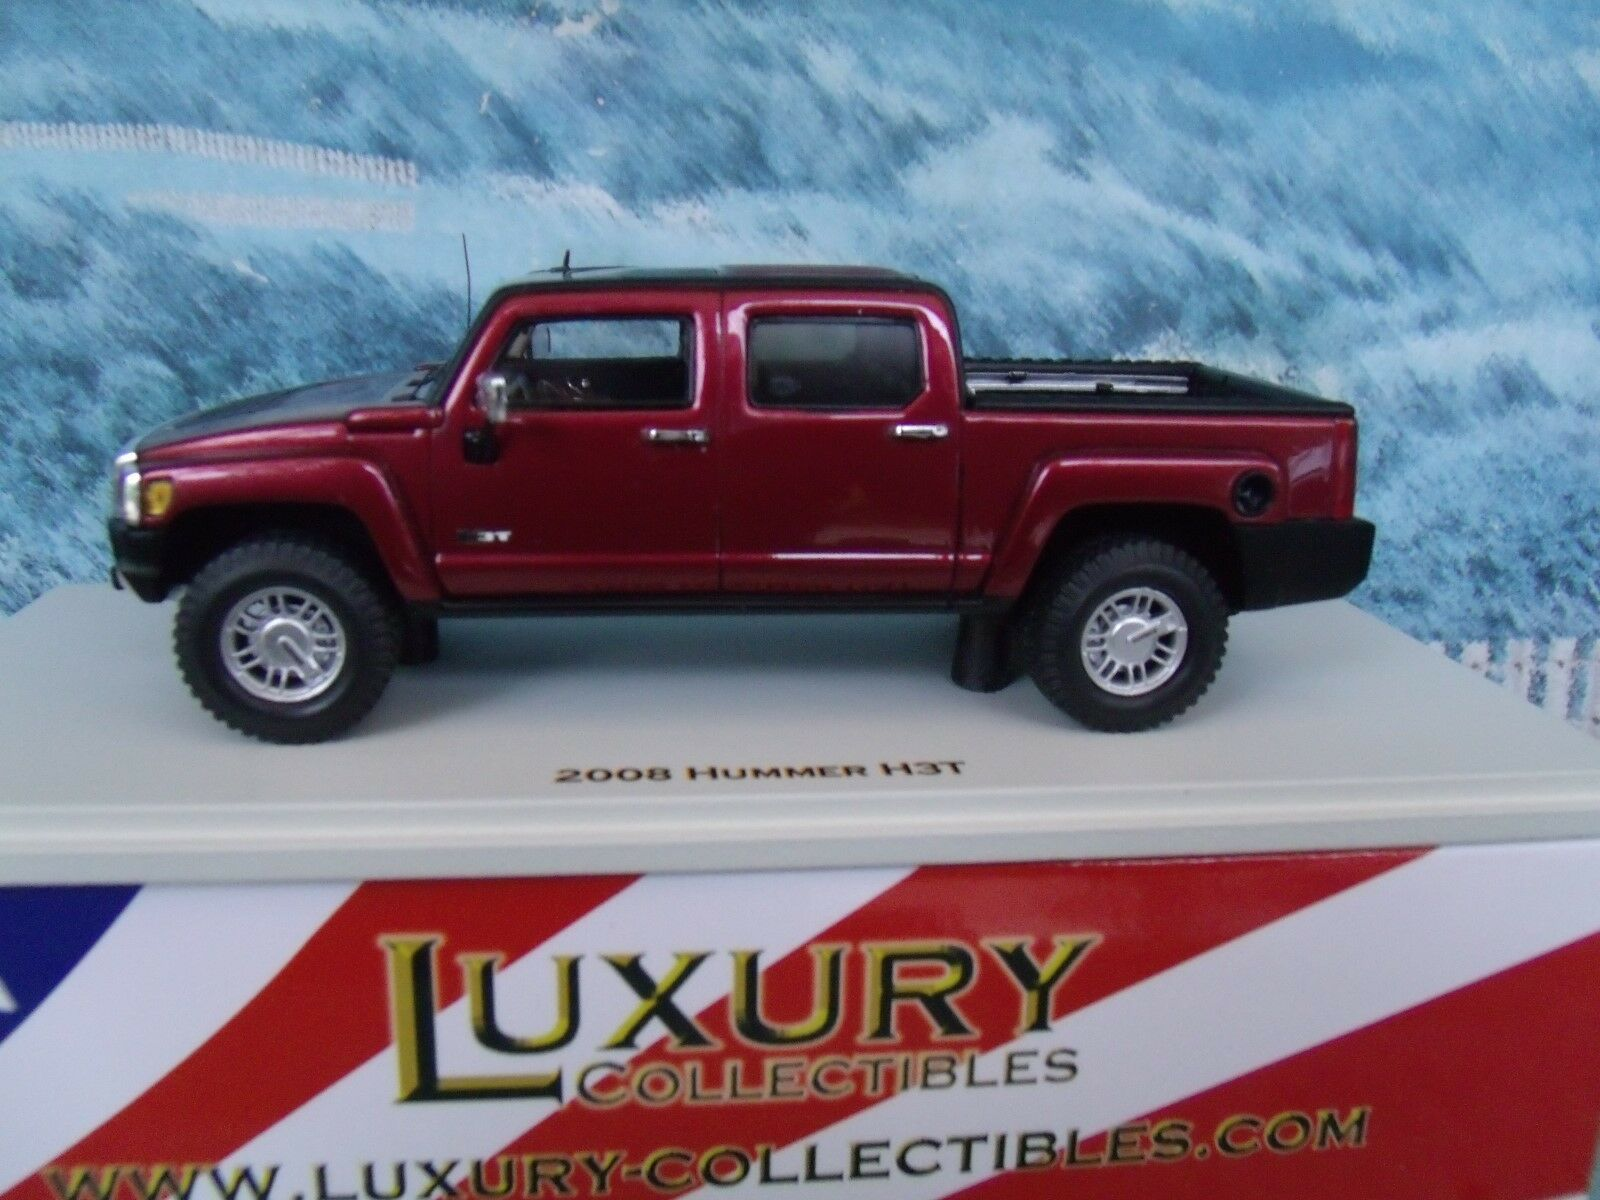 oferta especial 1 43 43 43 Lujo Coleccionables Hummer H3T 2008  moda